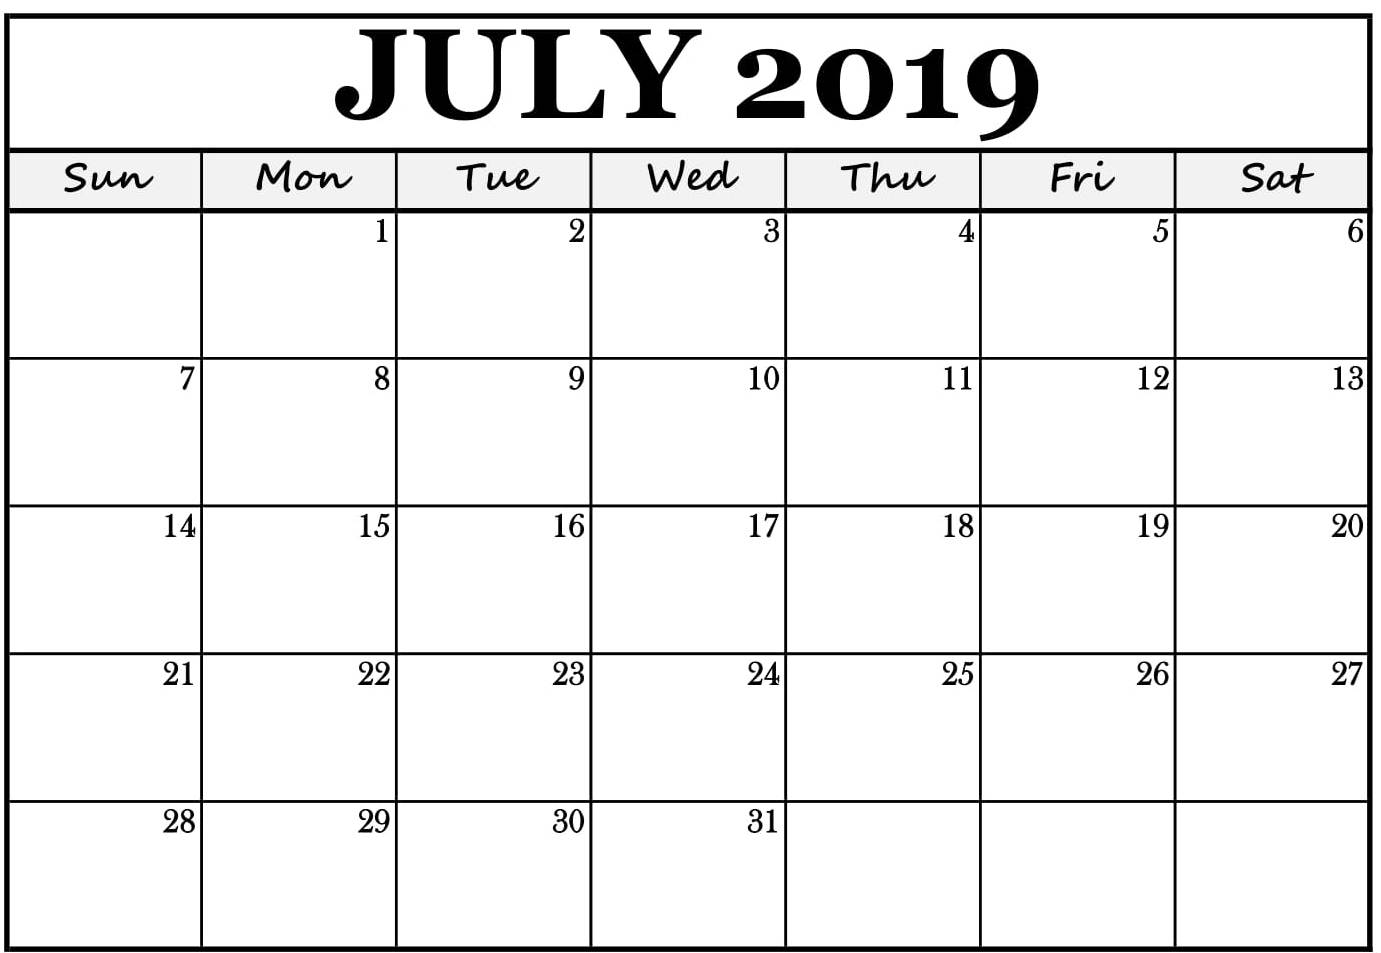 July 2019 Calendar Editable